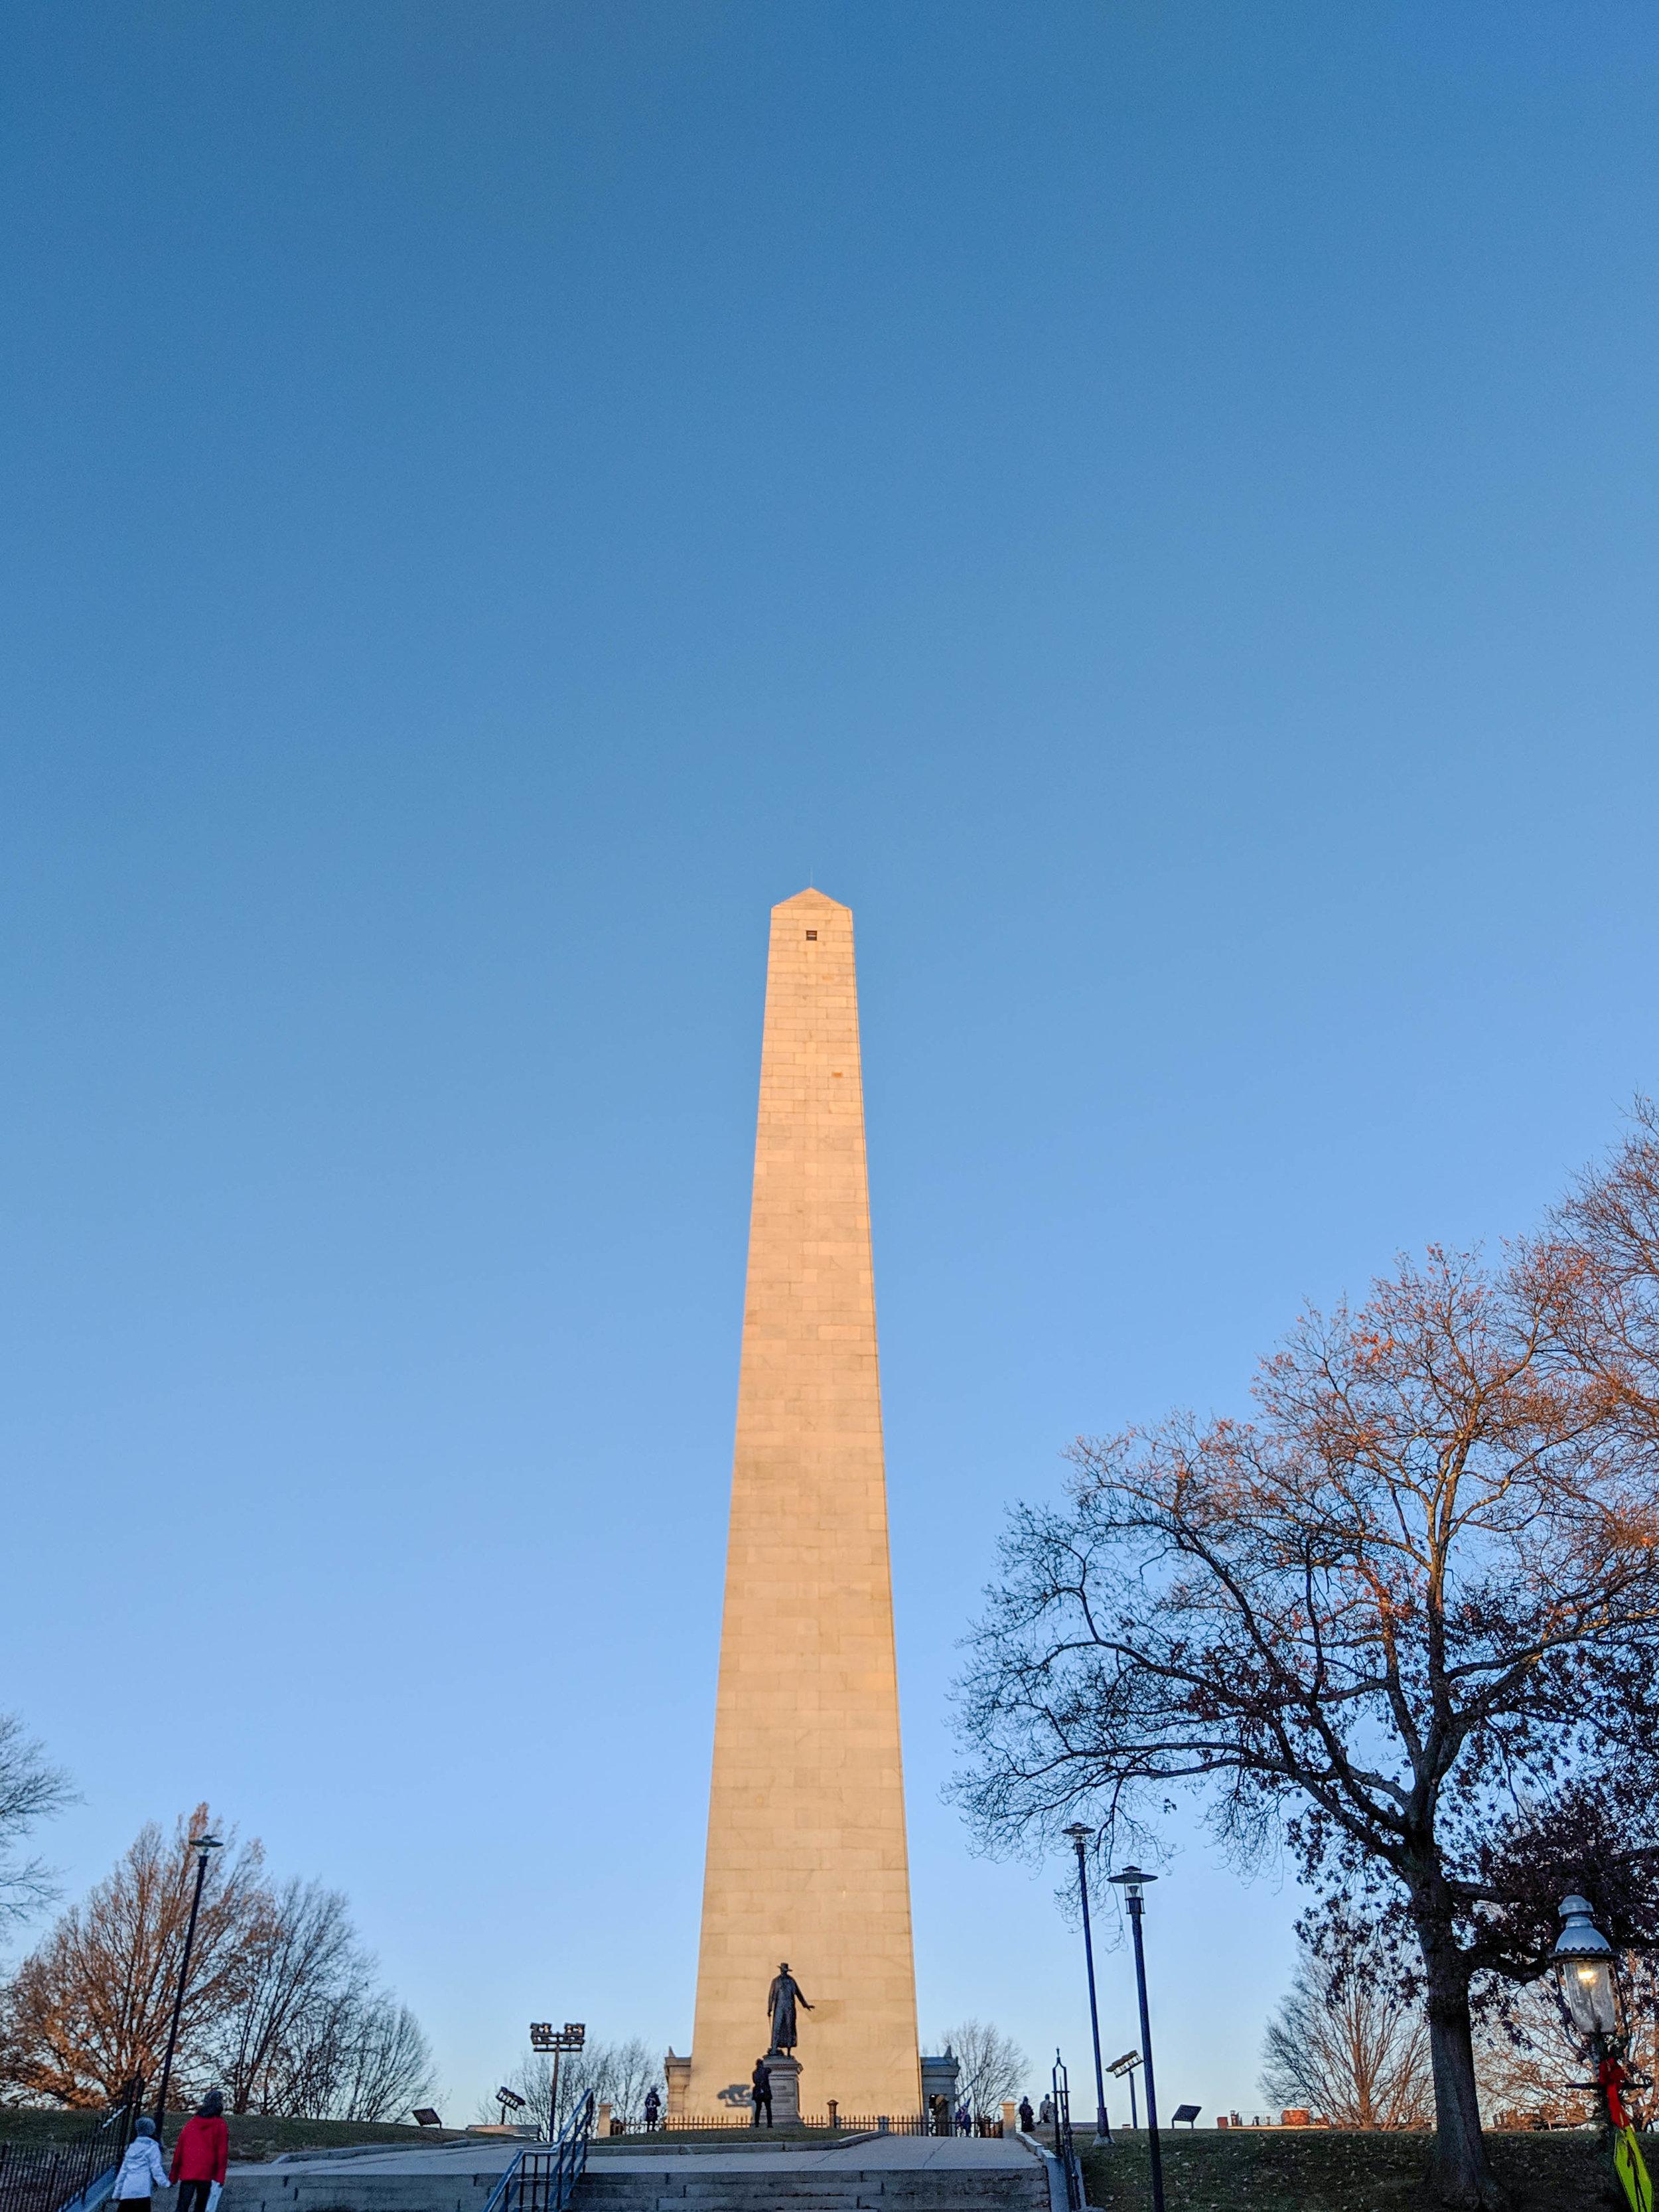 bri rinehart; photography; boston; bunker hill monument; charlestown